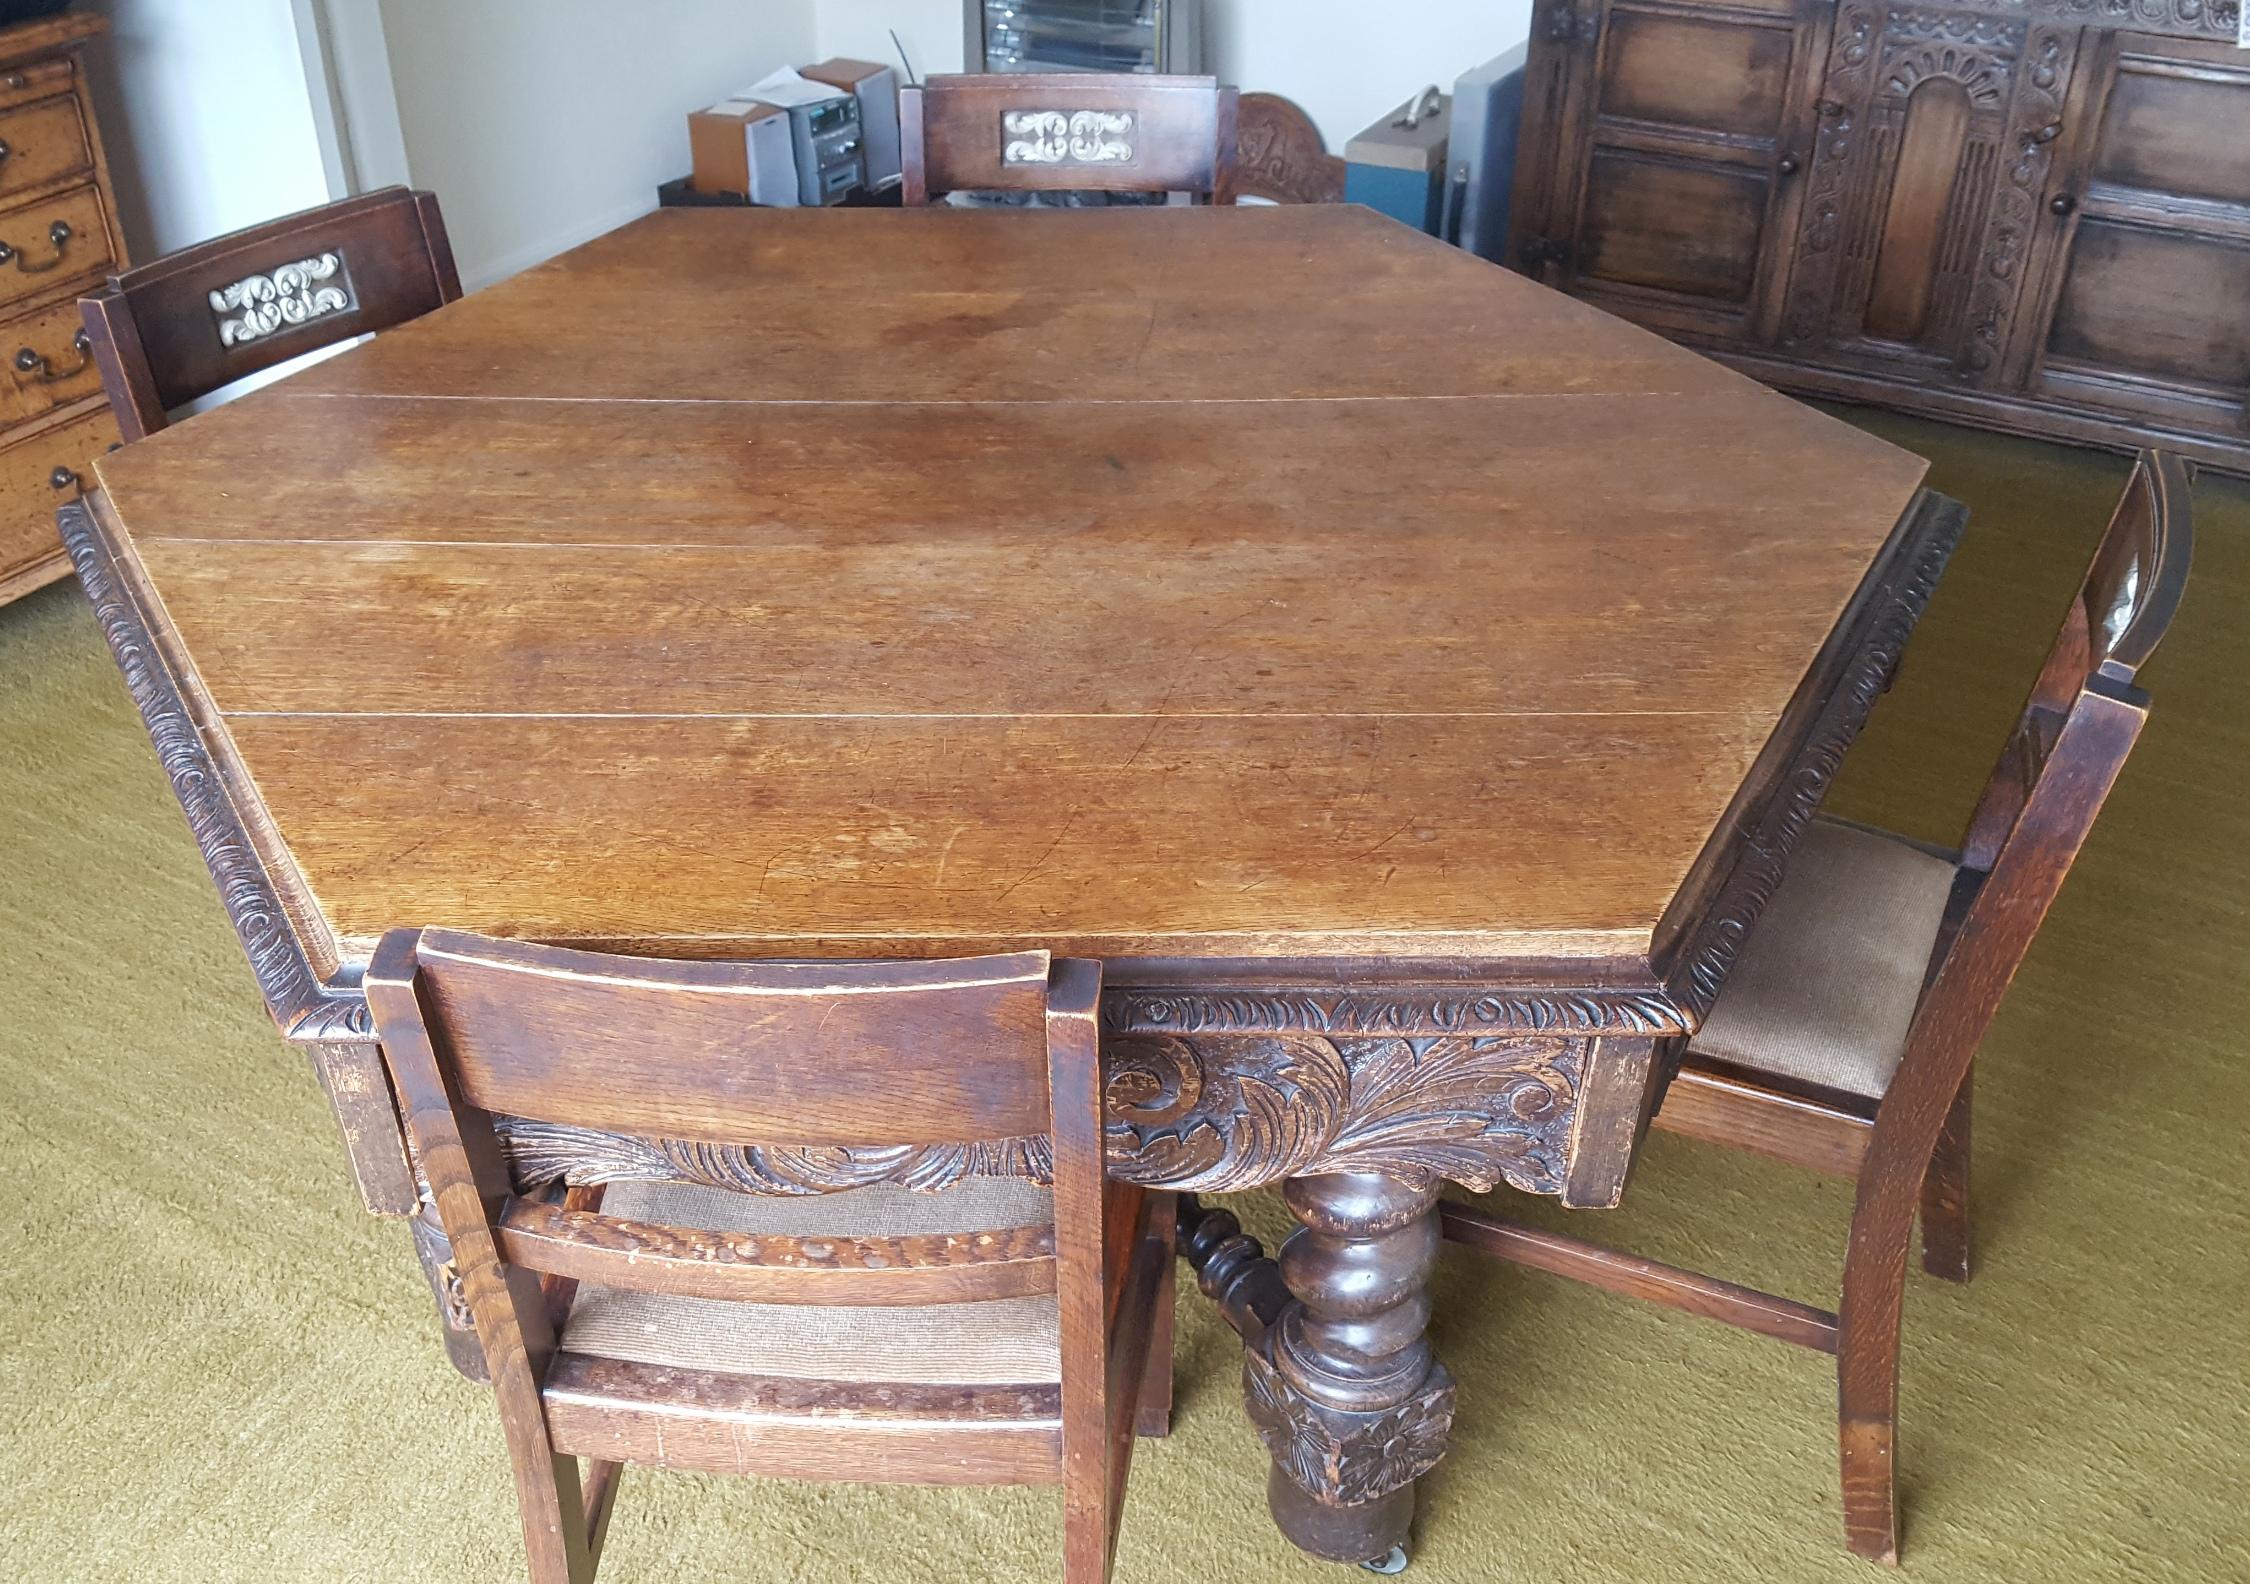 Lot 15 - Antique Vintage Victorian Hexagonal Oak Dining Table Bobbin Stretchers & Four Chairs